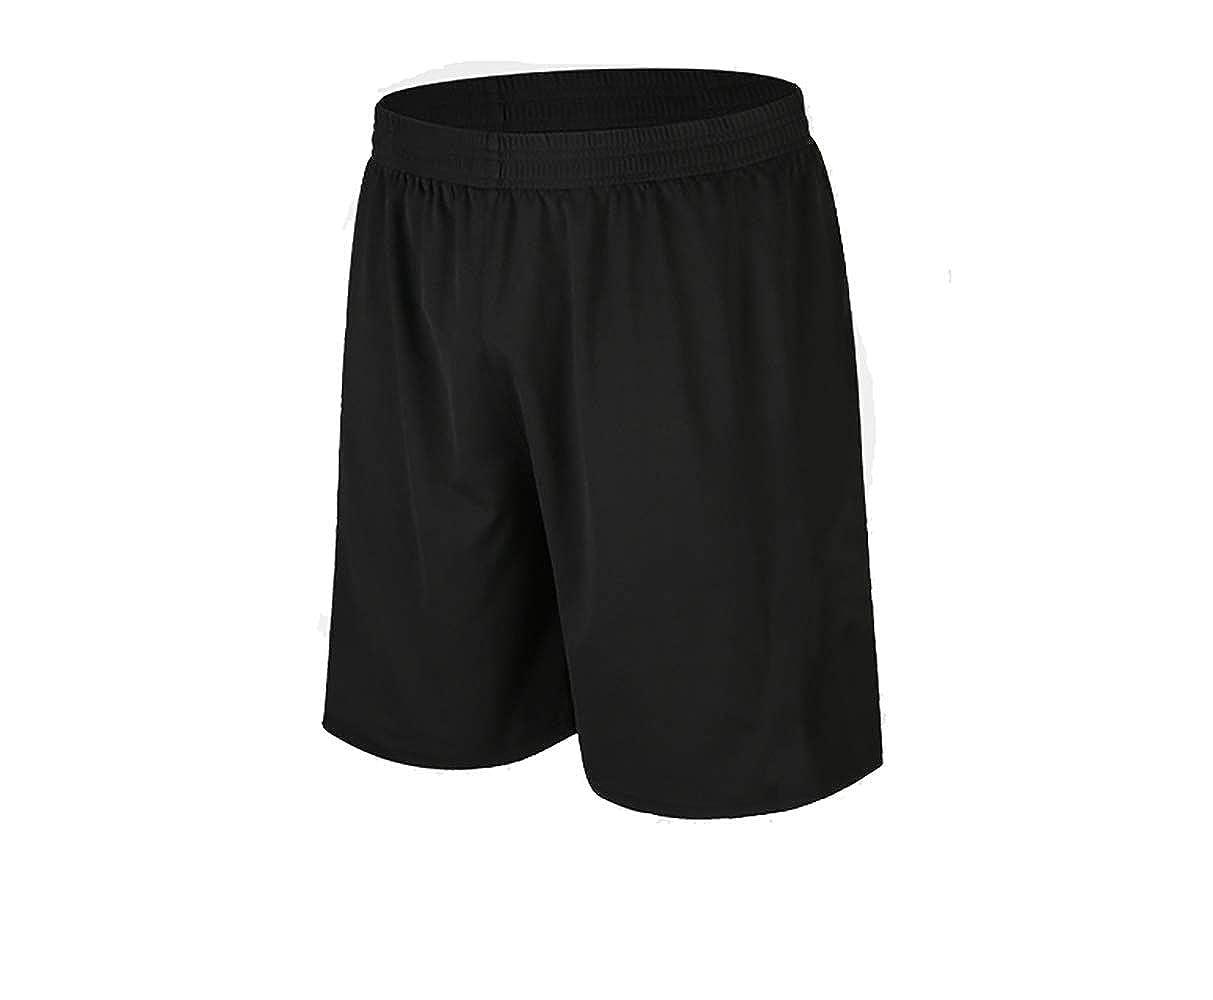 TALLA 46. Hestia.Y - Pantalón Corto Deportivo - para Hombre